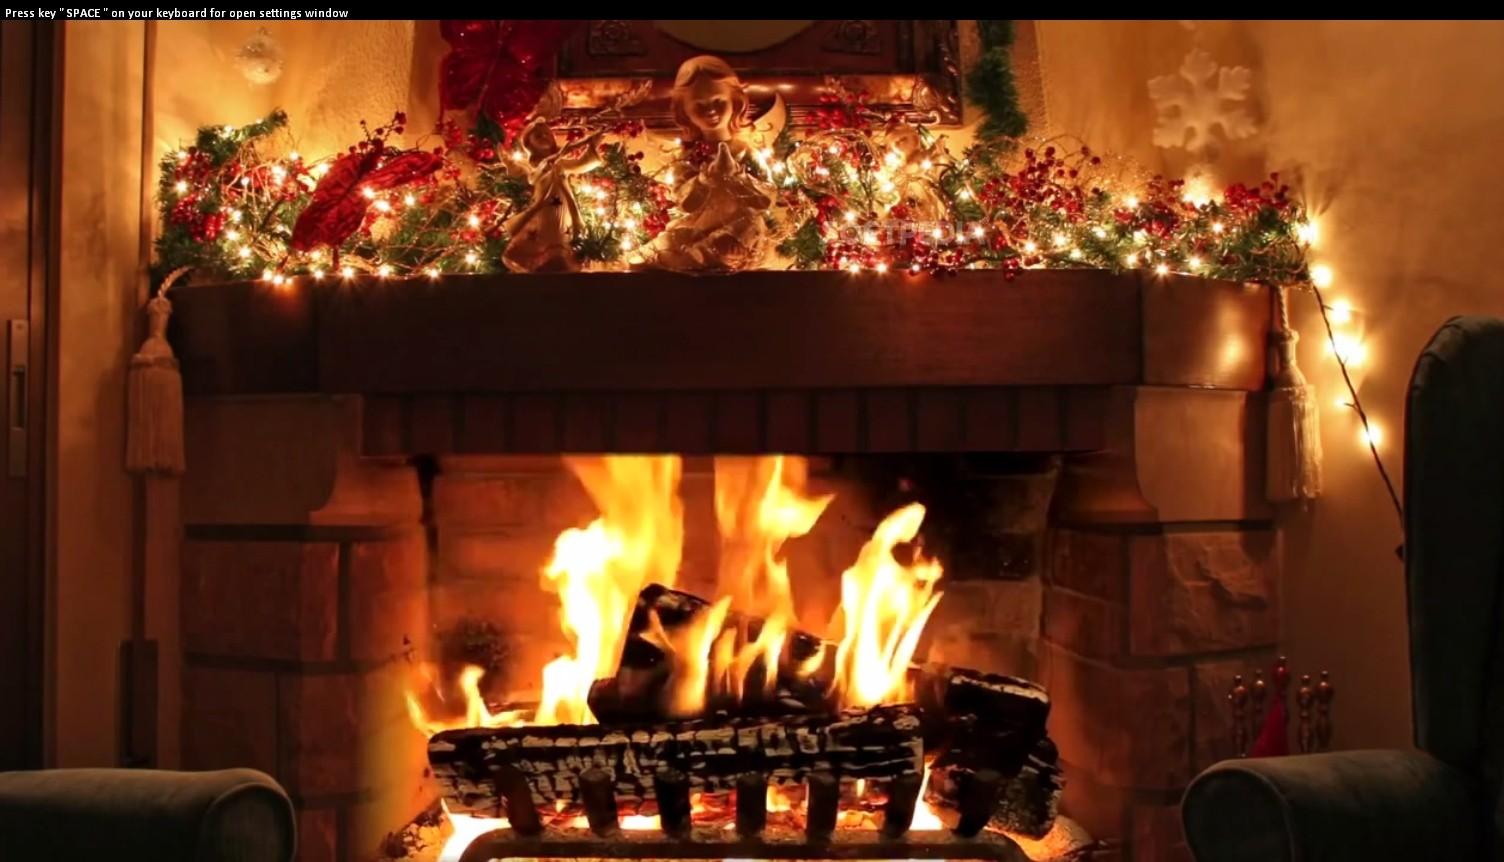 Christmas Fireplace ScreenSaver   Christmas Fireplace ScreenSaver is a 1504x862